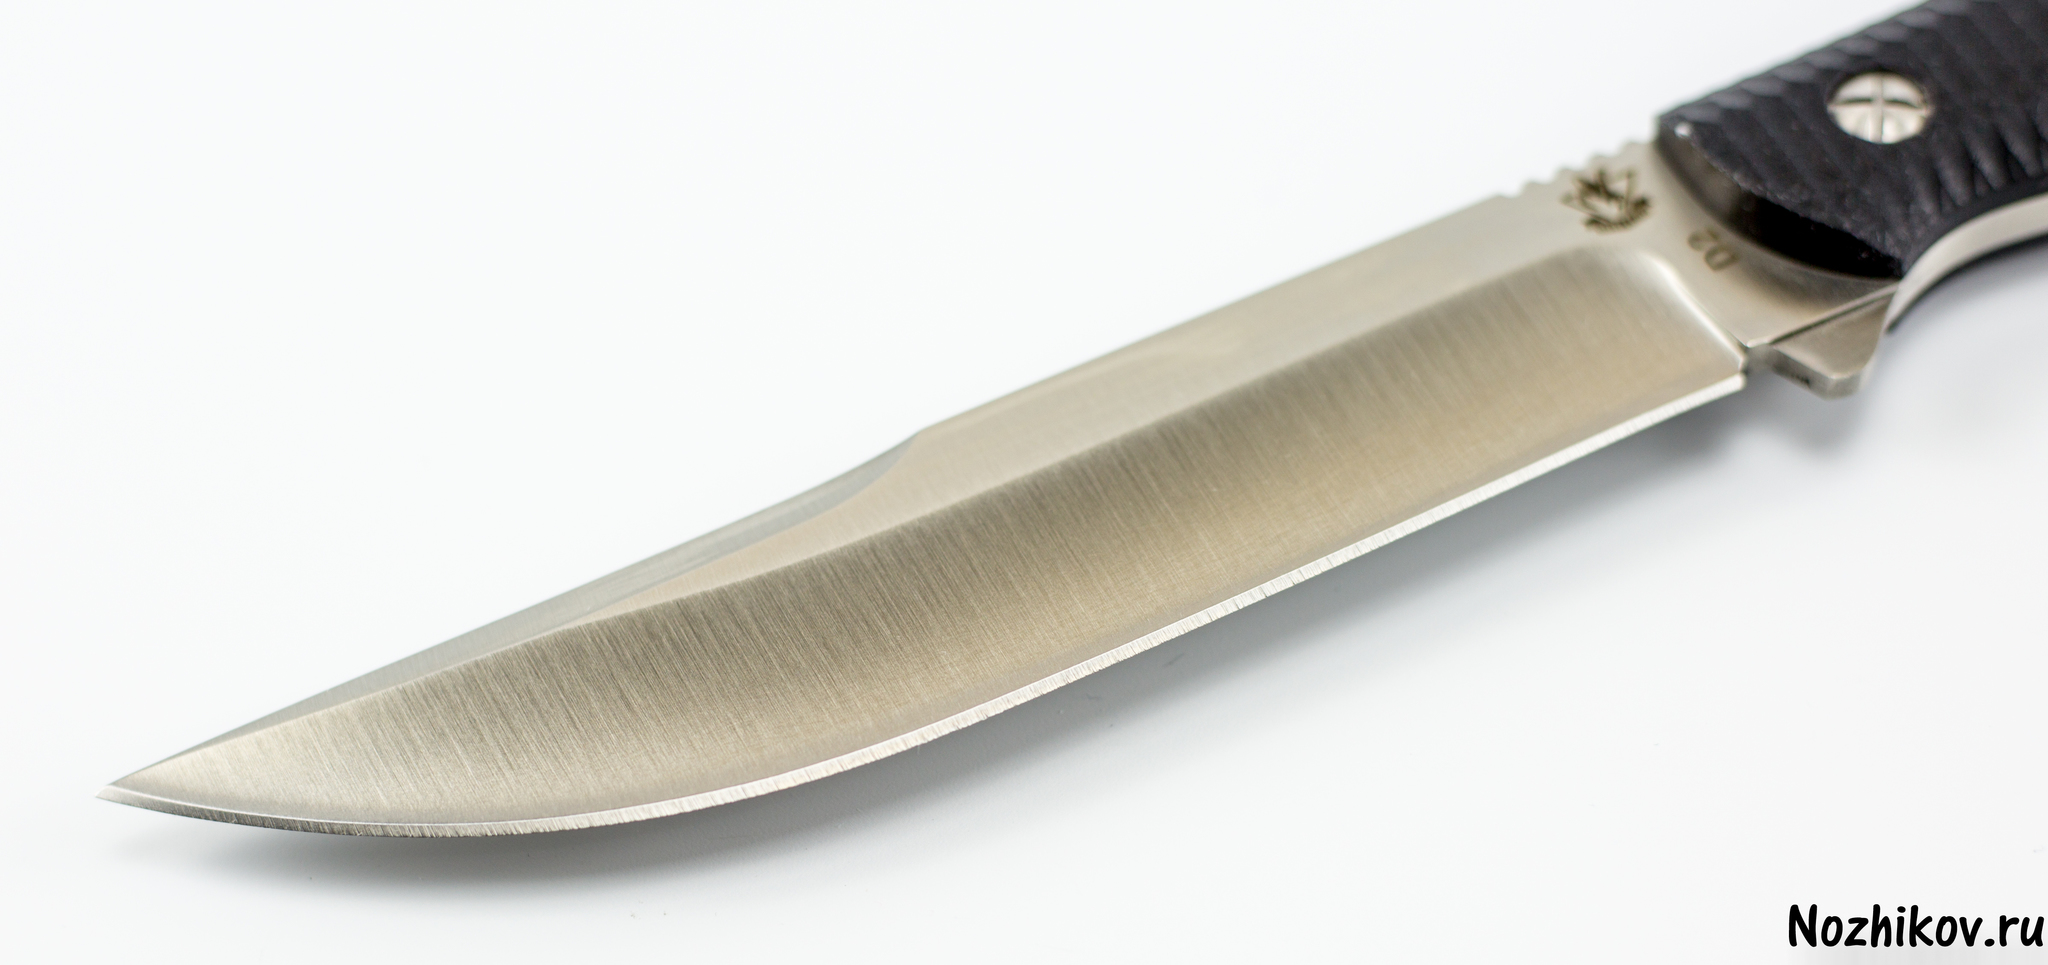 Фото 9 - Нож Ермак, Steelclaw